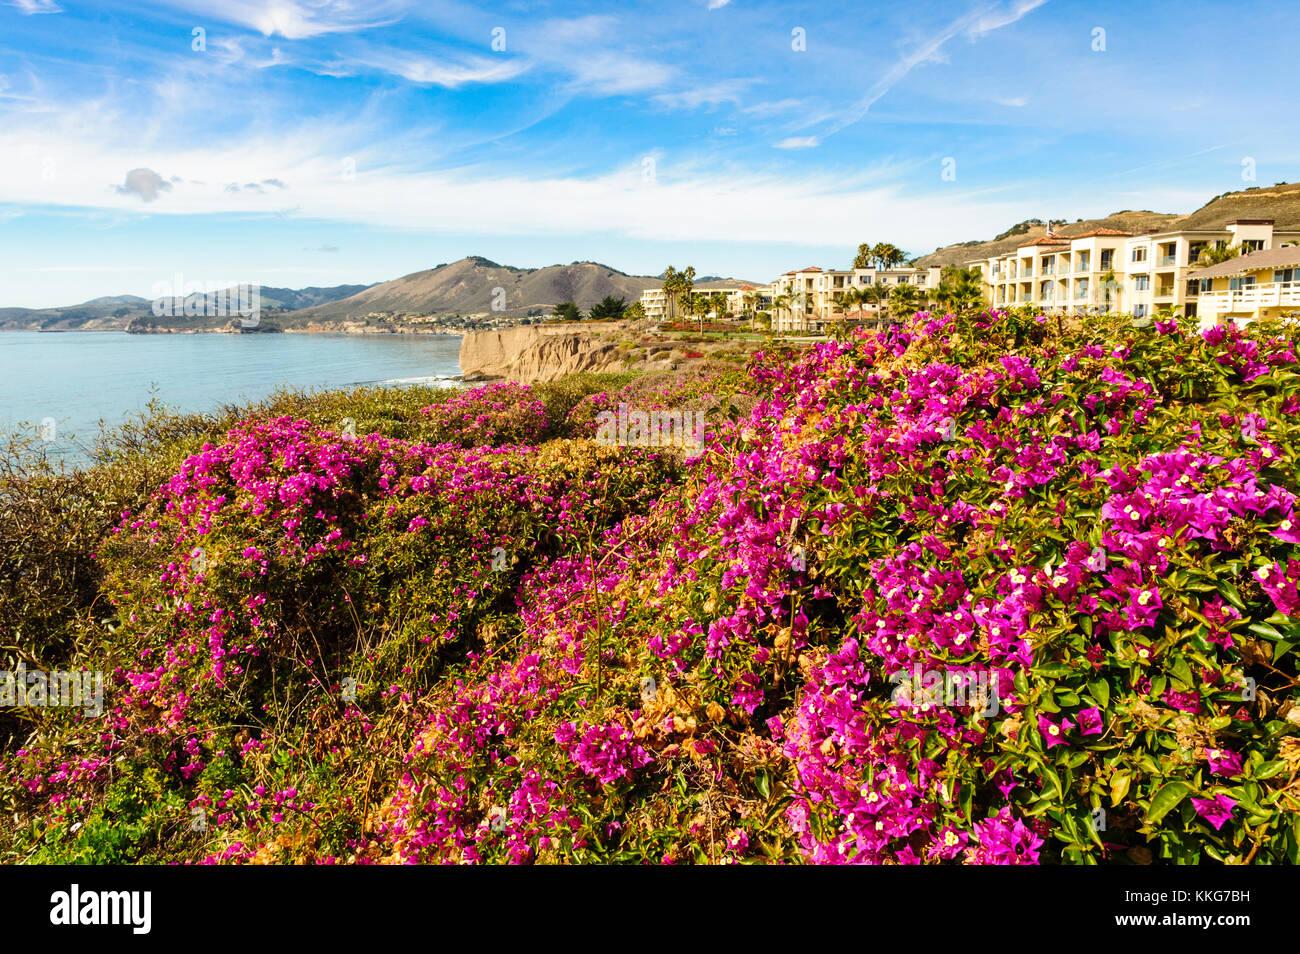 Pismo Beach, Shell Beach, oceanview from Spyglass Inn hotel on Highway 1, California, USA. Pink, magenta flowers - Stock Image